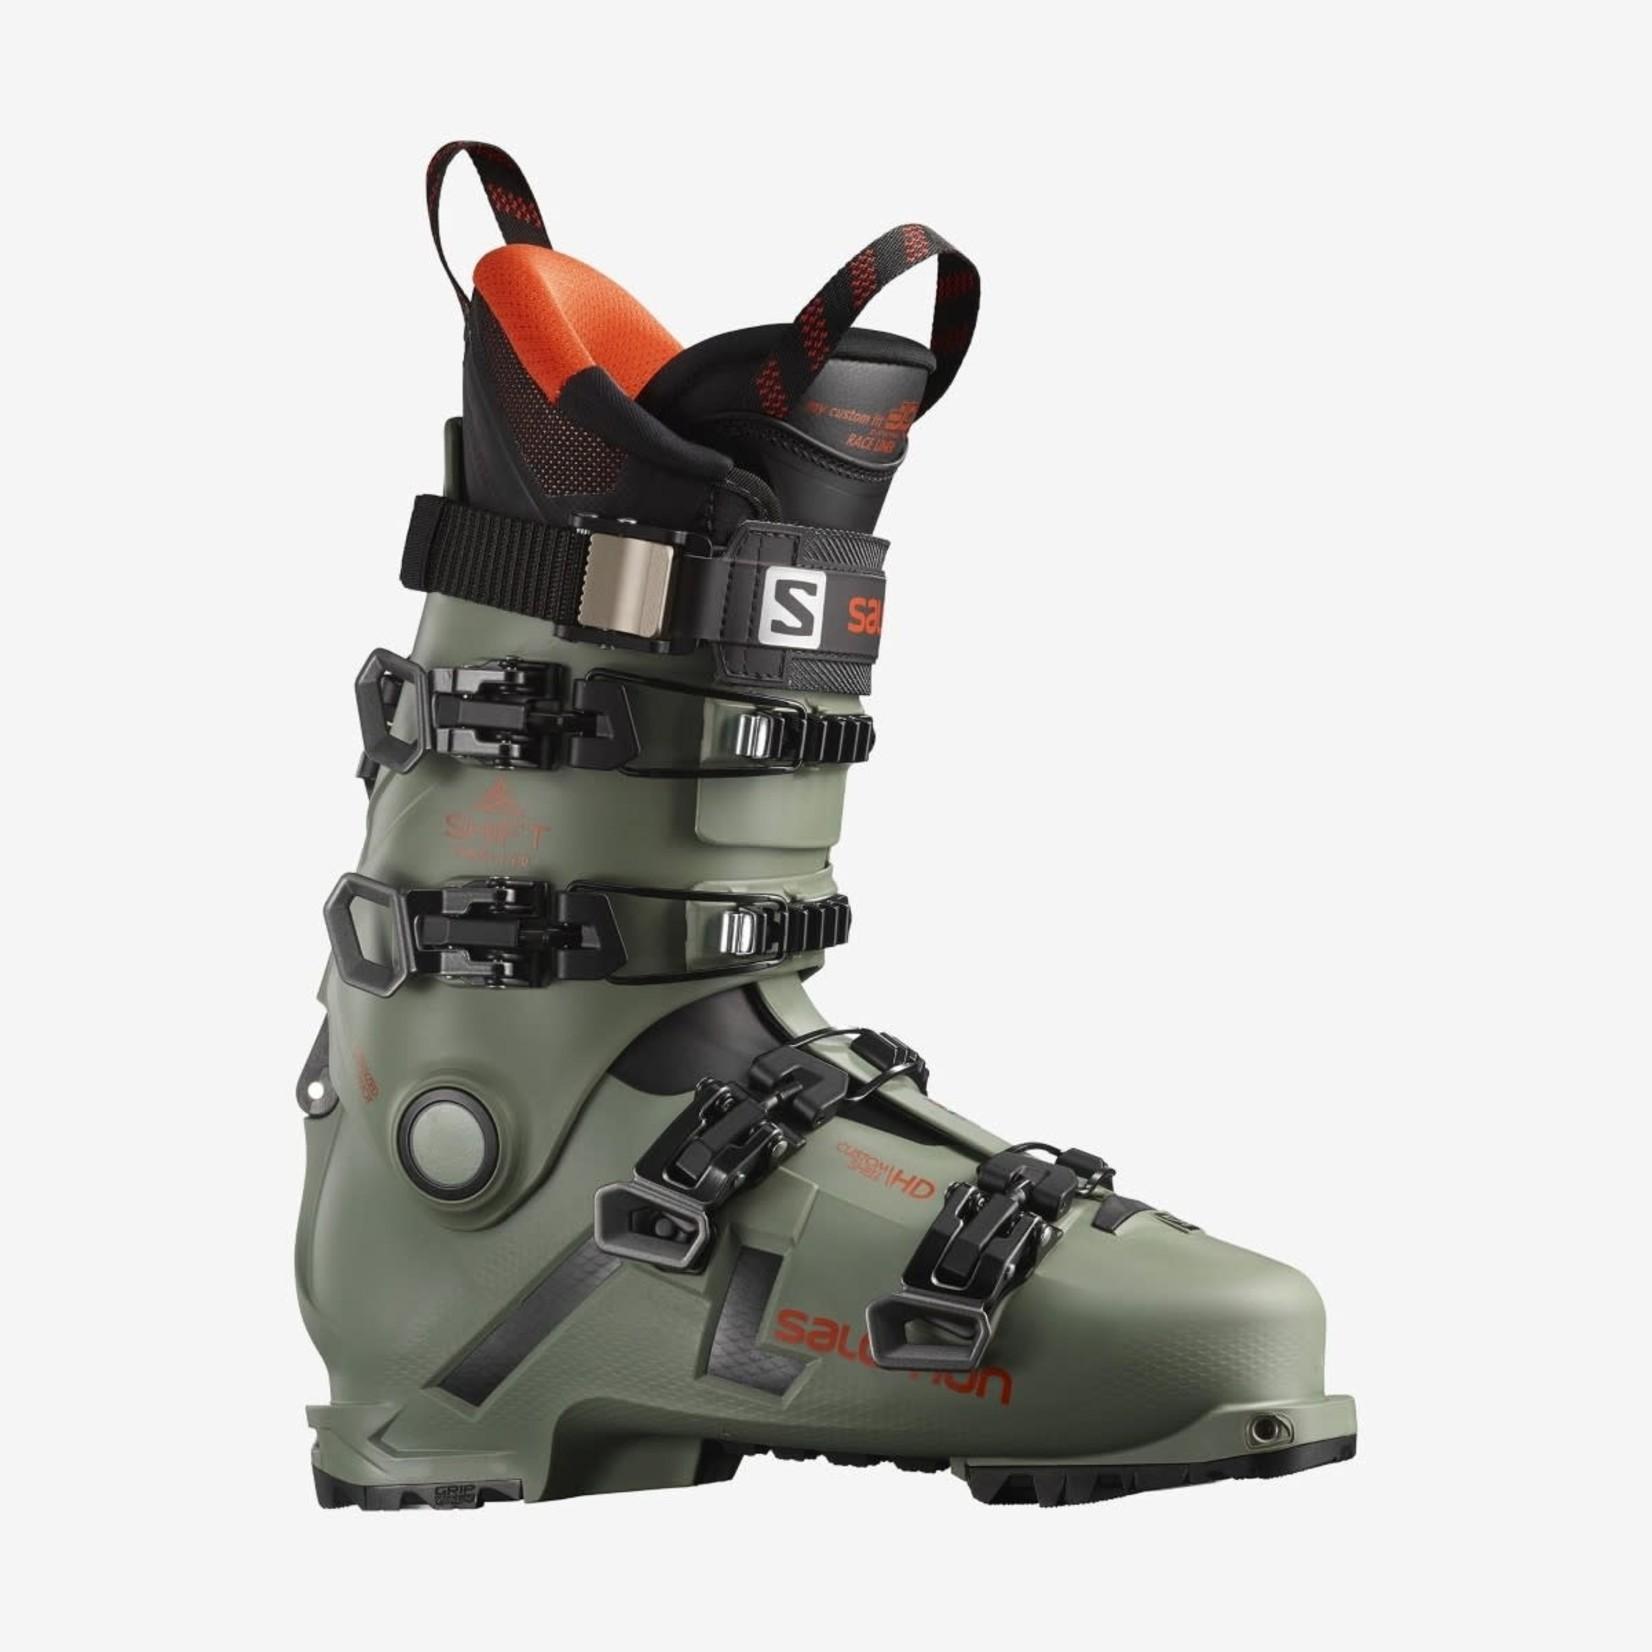 Salomon Botte de ski Salomon Shift Pro 130 - Homme